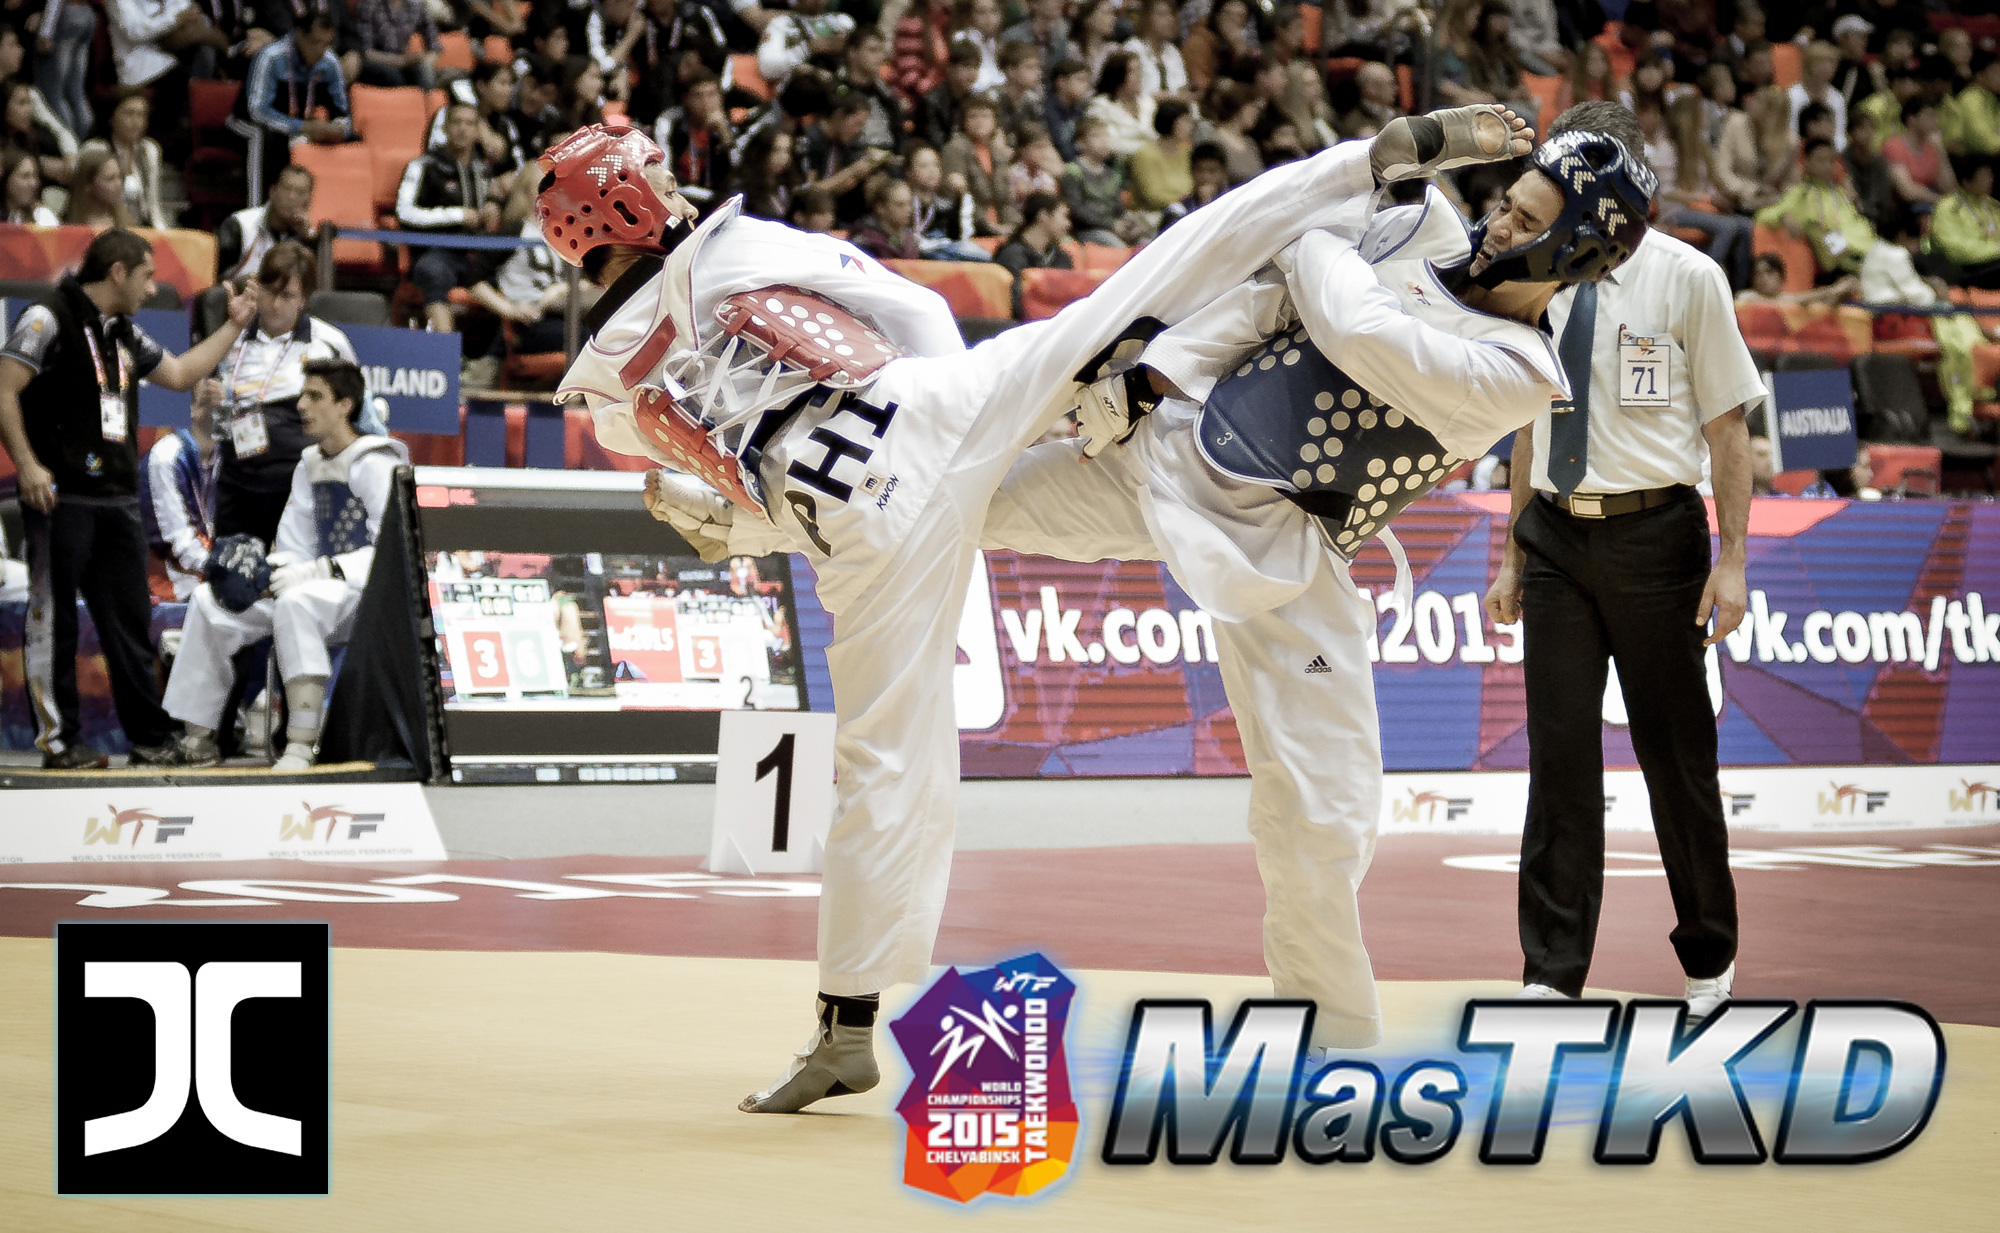 04_Mundial-Taekwondo_JCalicu-Seleccion-Mejor-Foto